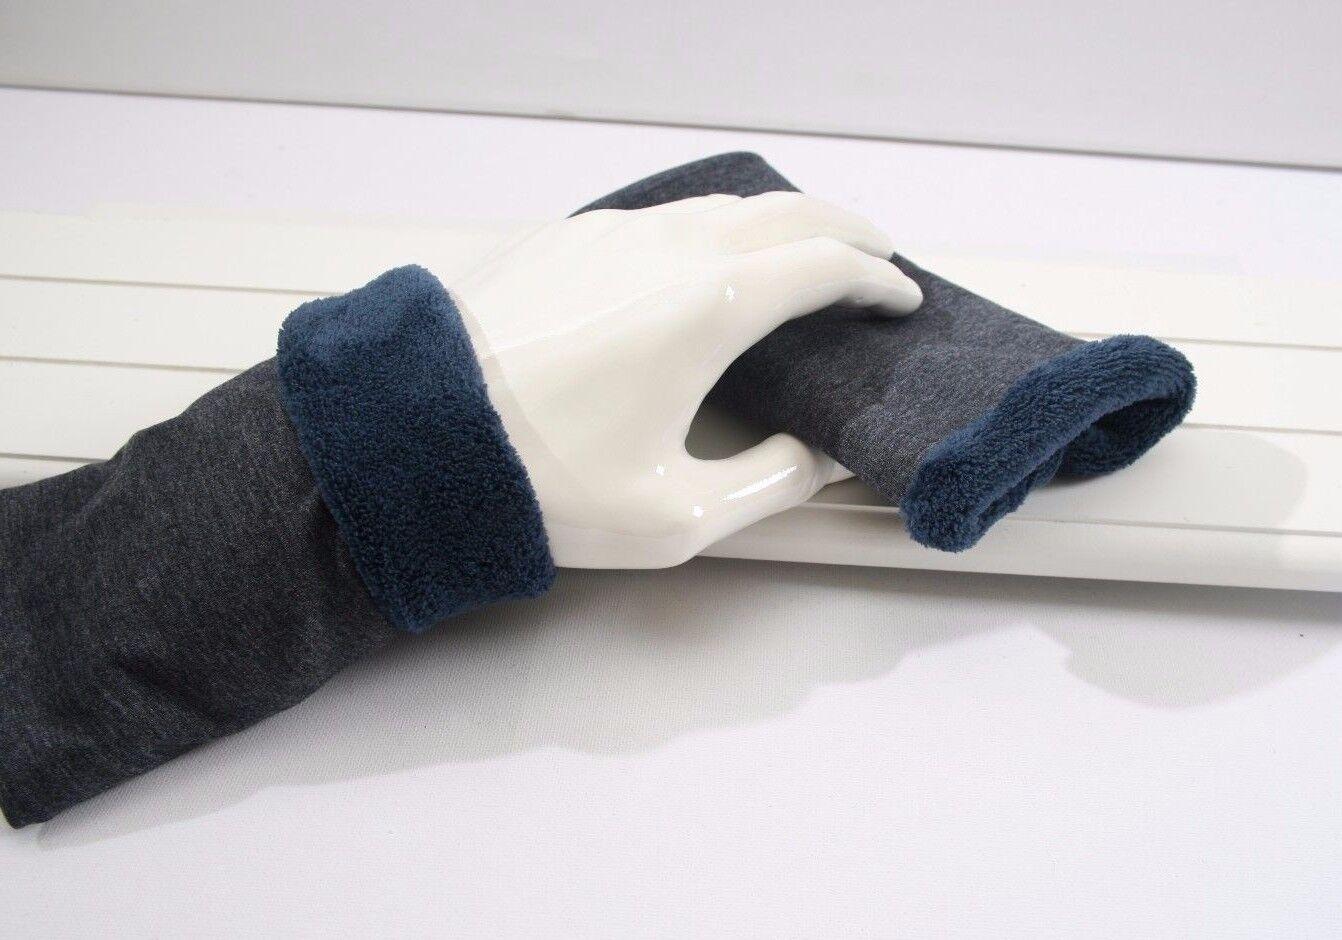 Neu Armstulpen Damen Herren Pulswärmer Blau Grau Jersey gefüttert Fleece